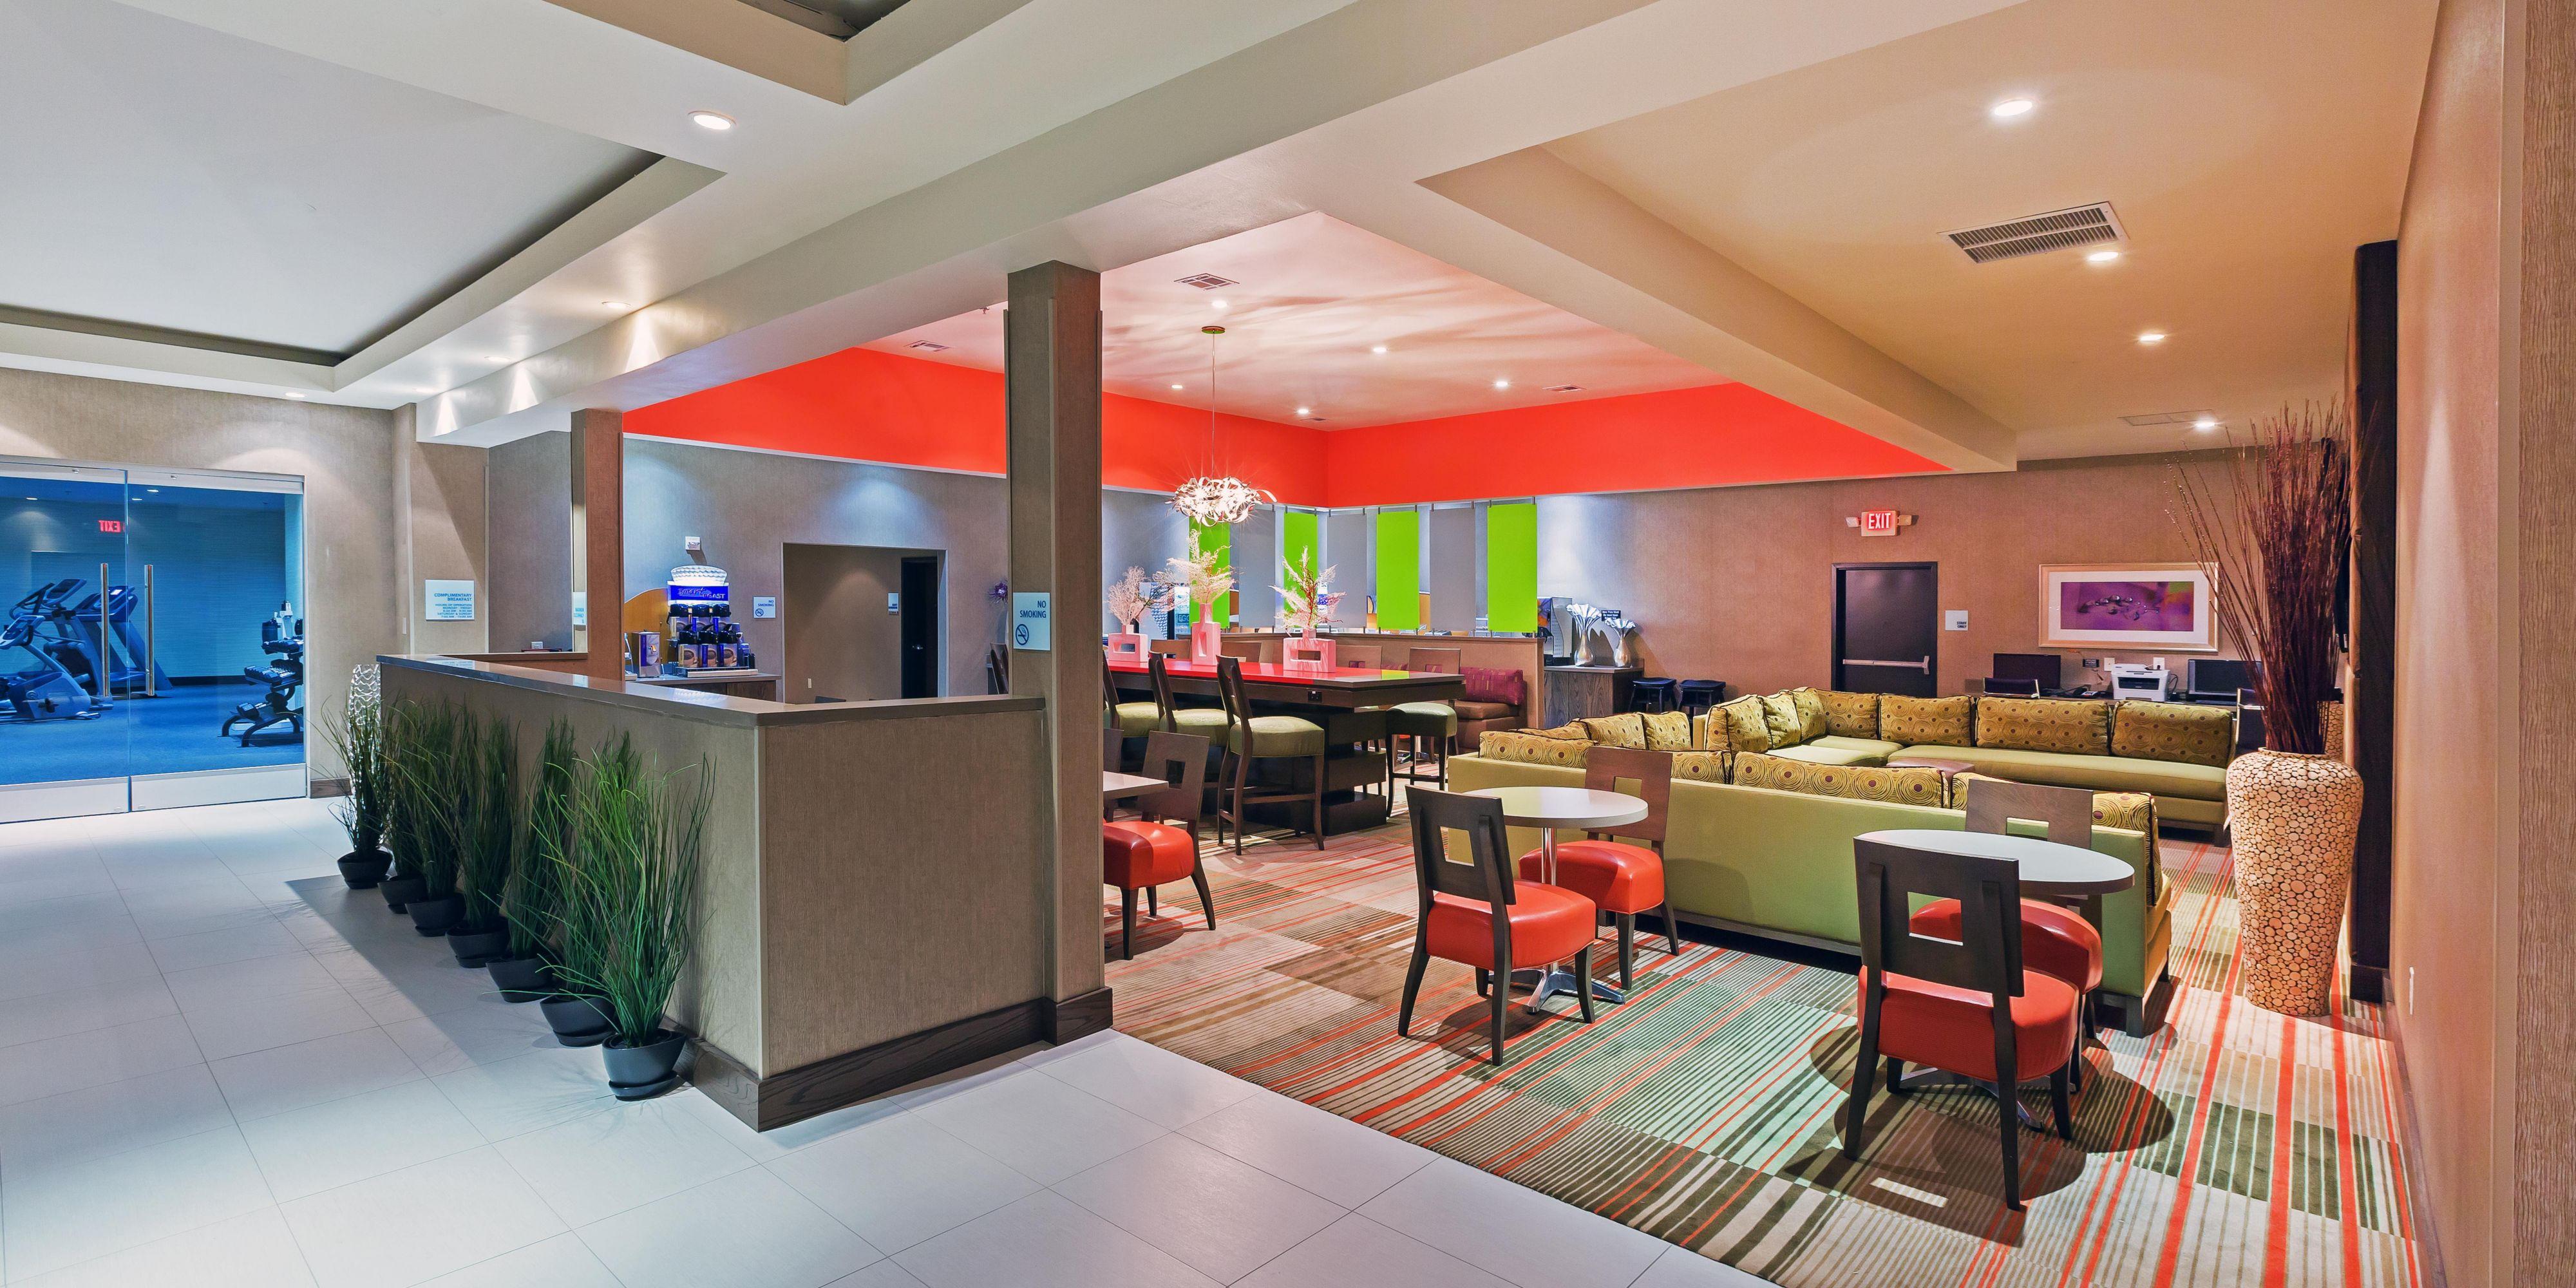 North Dallas Hotels in Frisco, TX | Holiday Inn Express Frisco